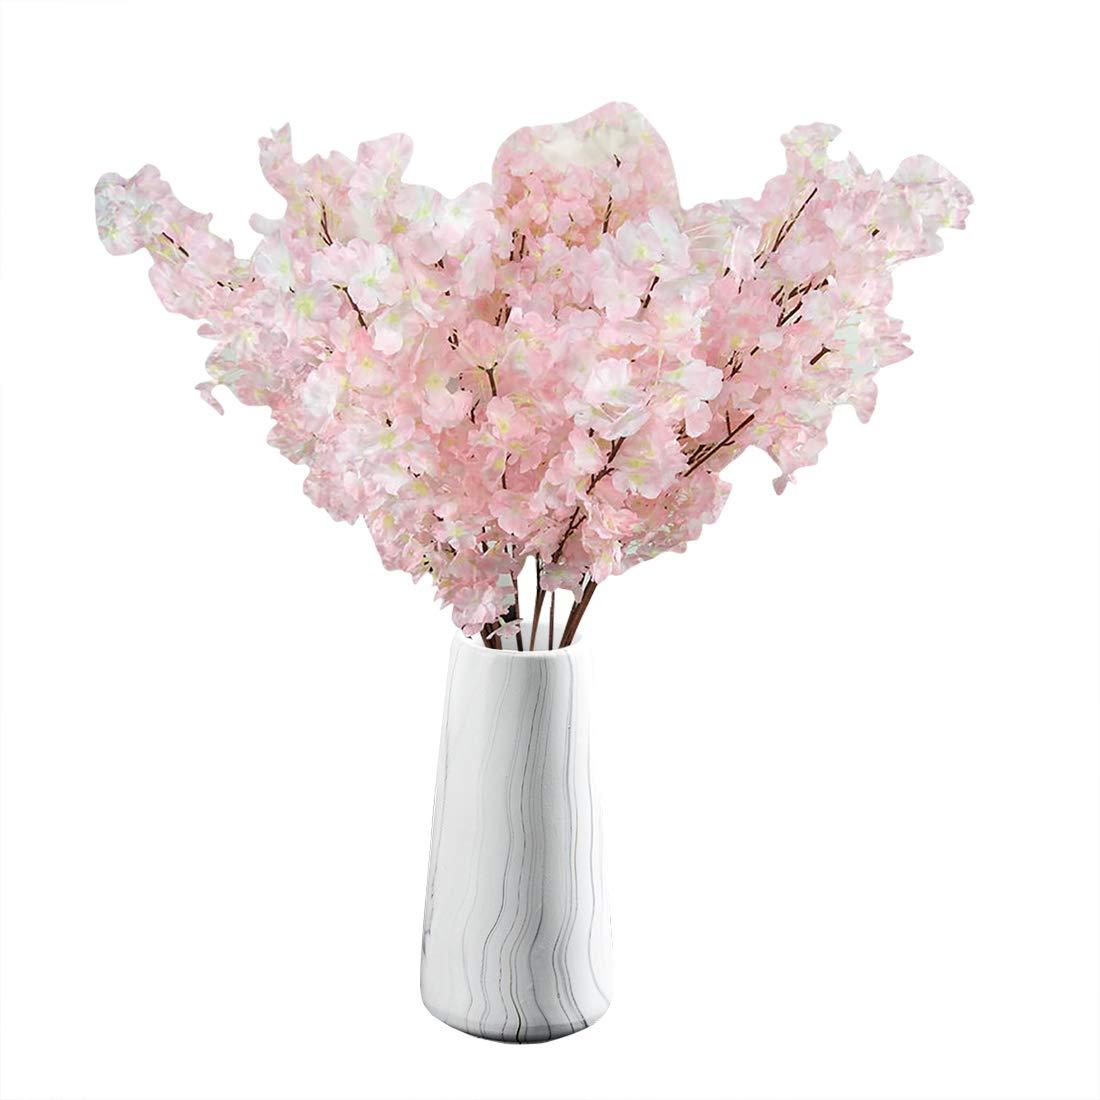 TtMarket 造花 桜の枝 シルク造花 39インチ 人工チェリーフラワーアレンジメント ホーム/ウェディング/オフィス装飾用 6個 ピンク B07PZ11V15 ピンク